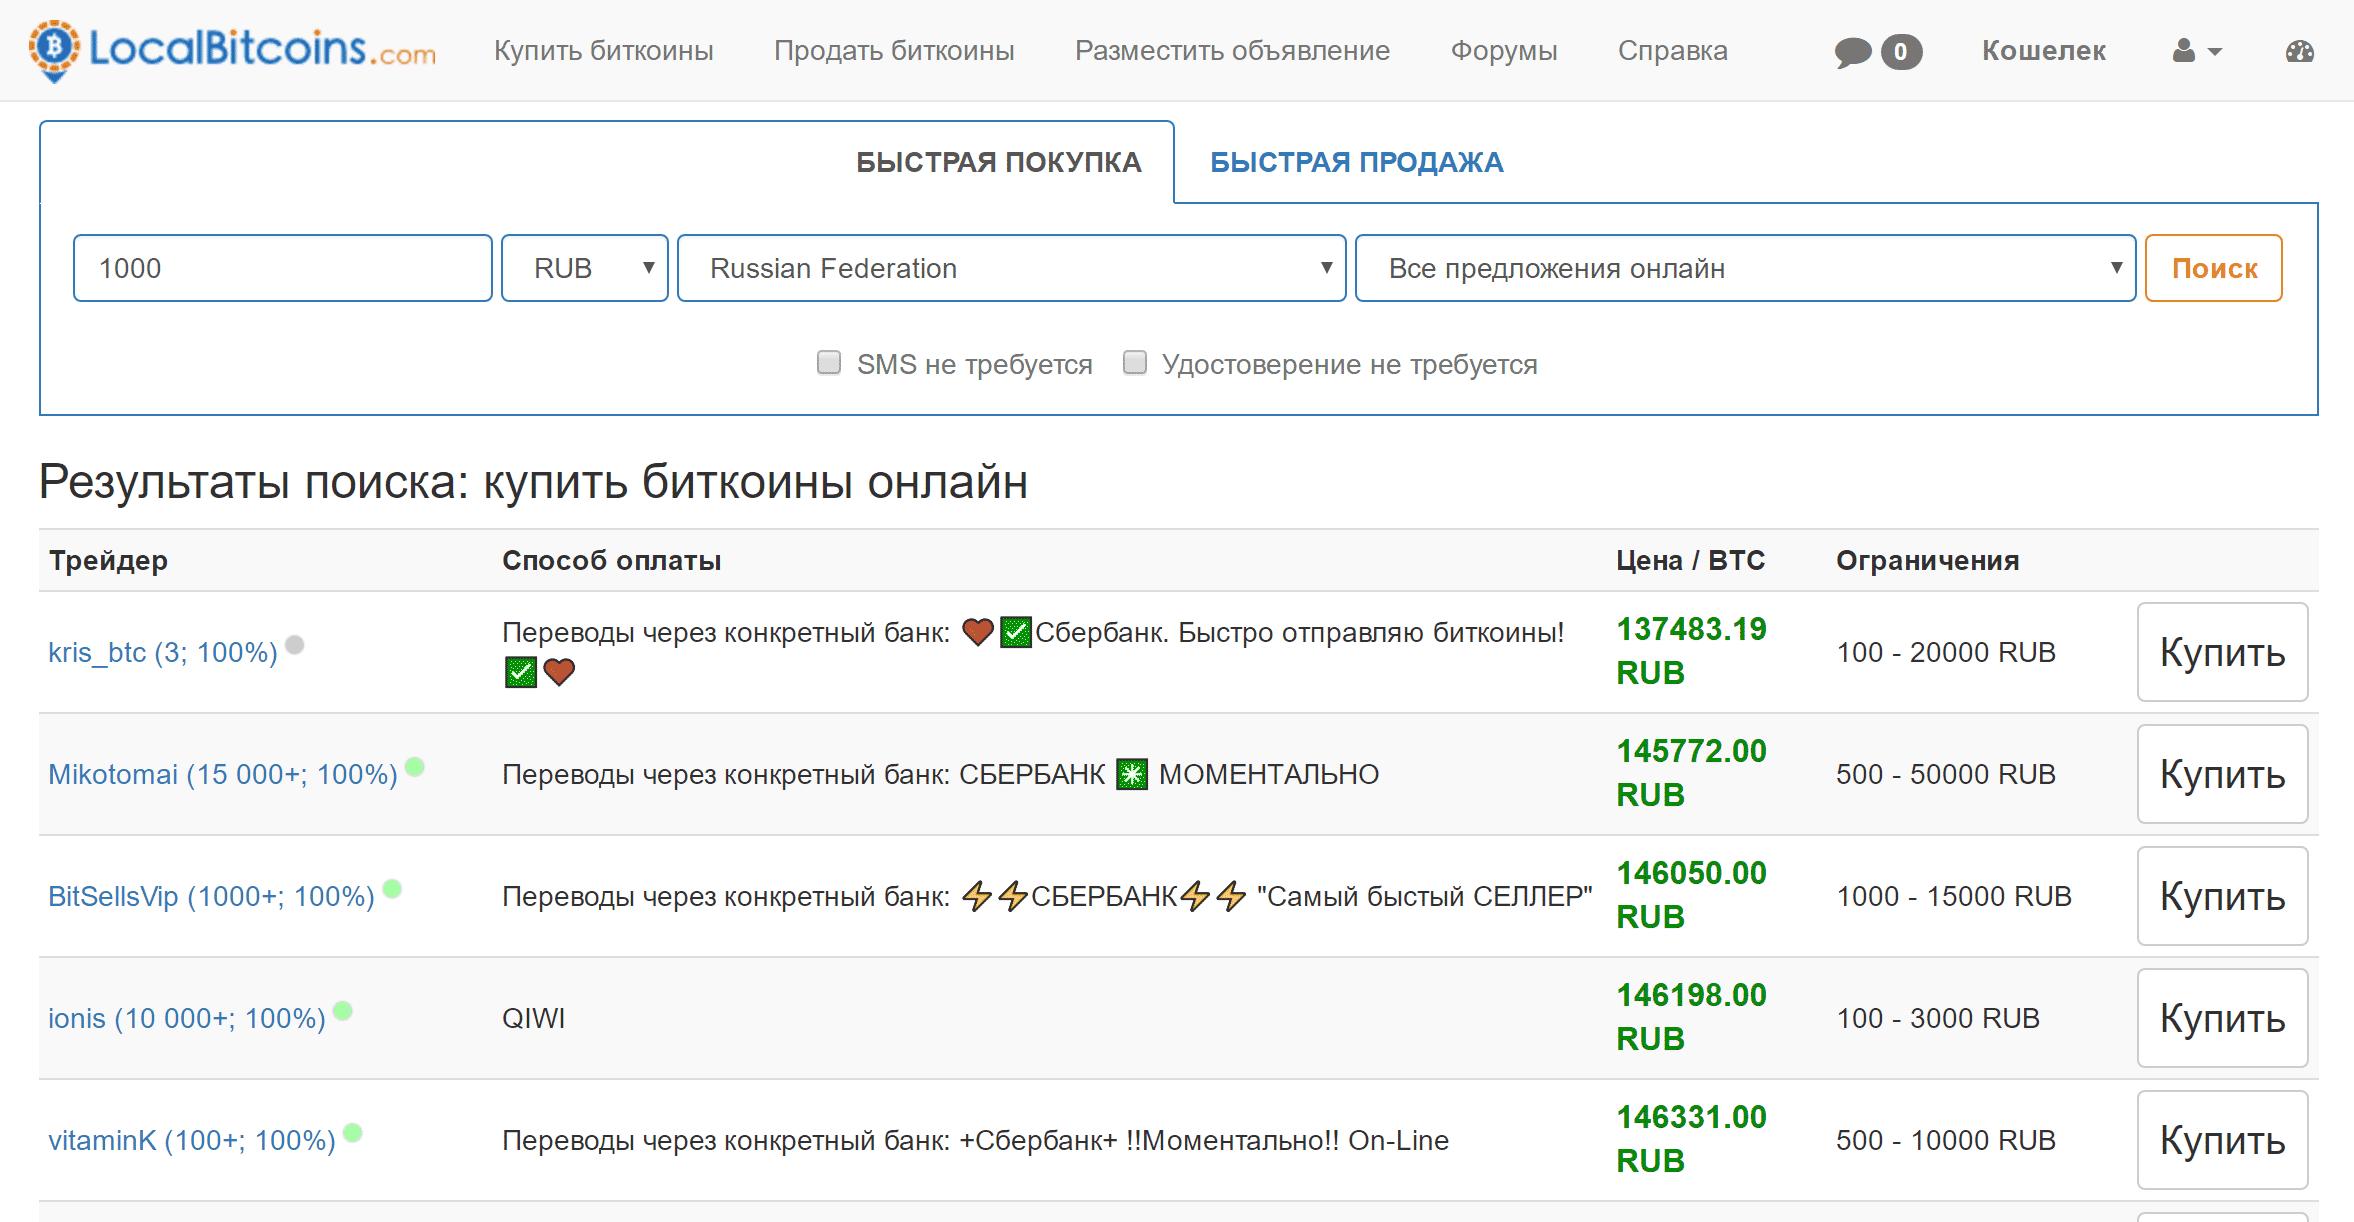 hány bitcoint lehet keresni naponta